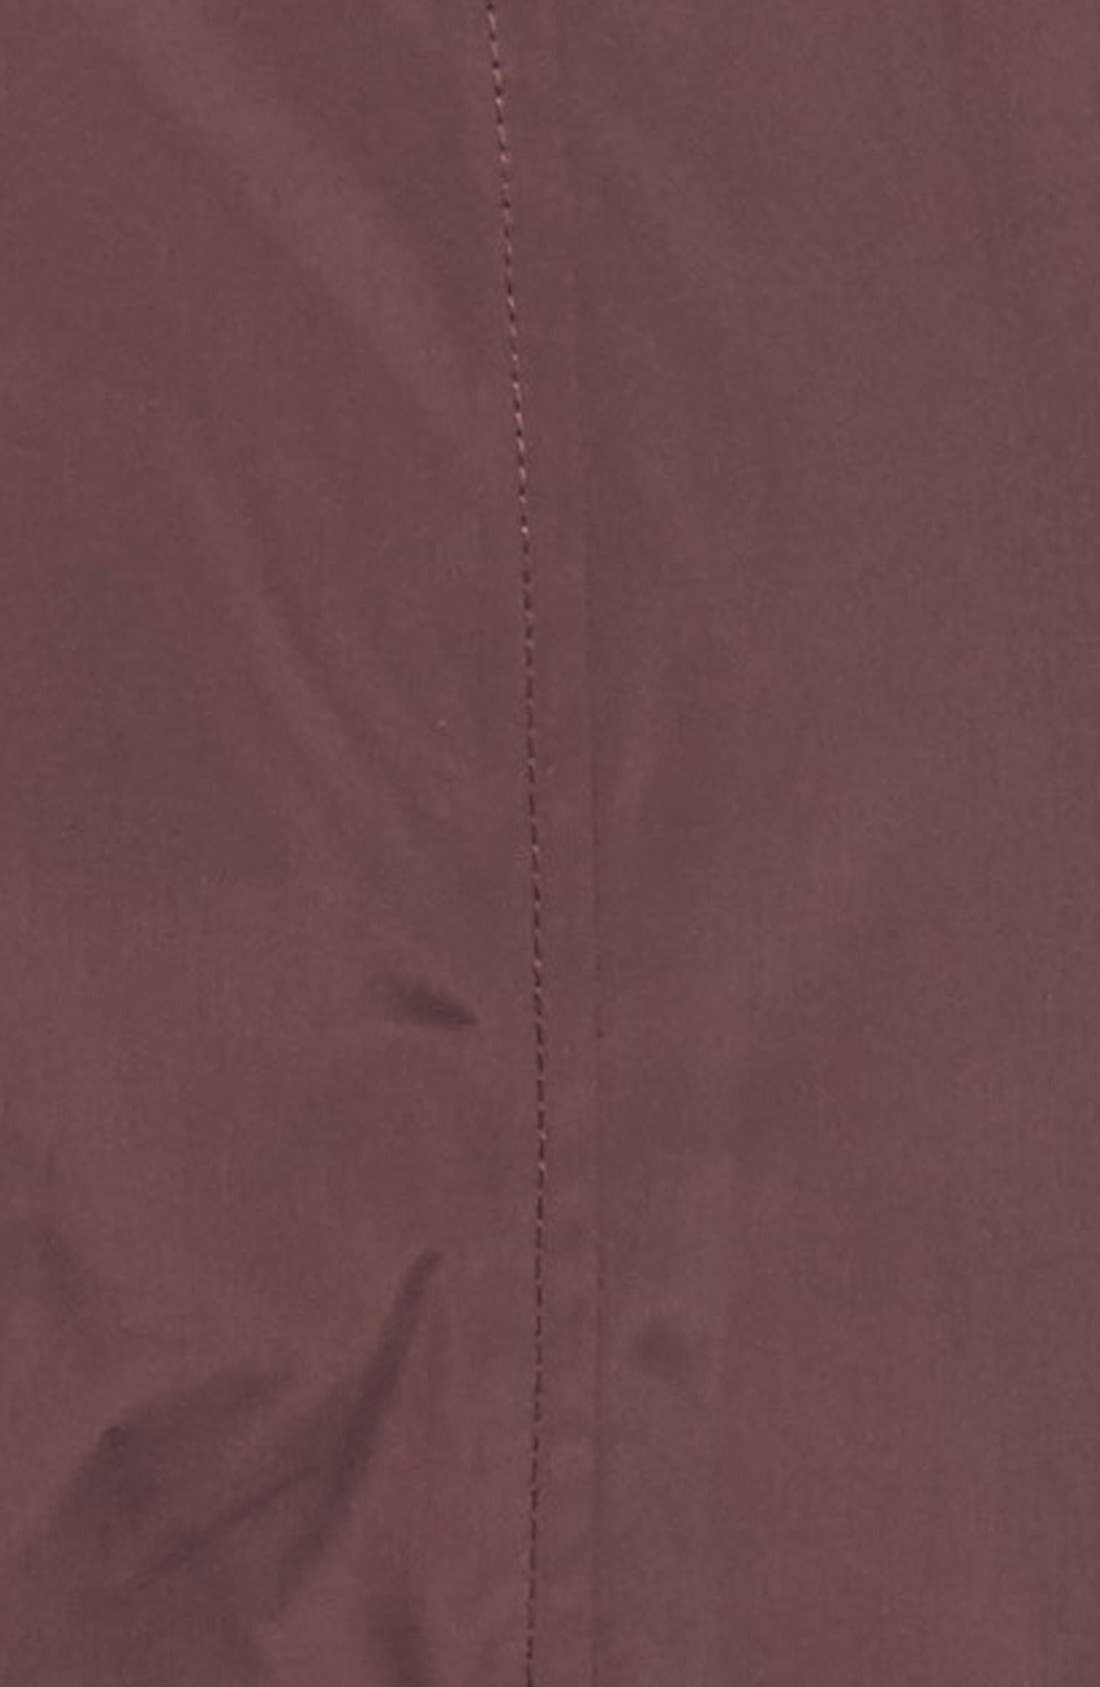 Cole Haan Water Resistant Rain Jacket,                             Alternate thumbnail 6, color,                             Eggplant